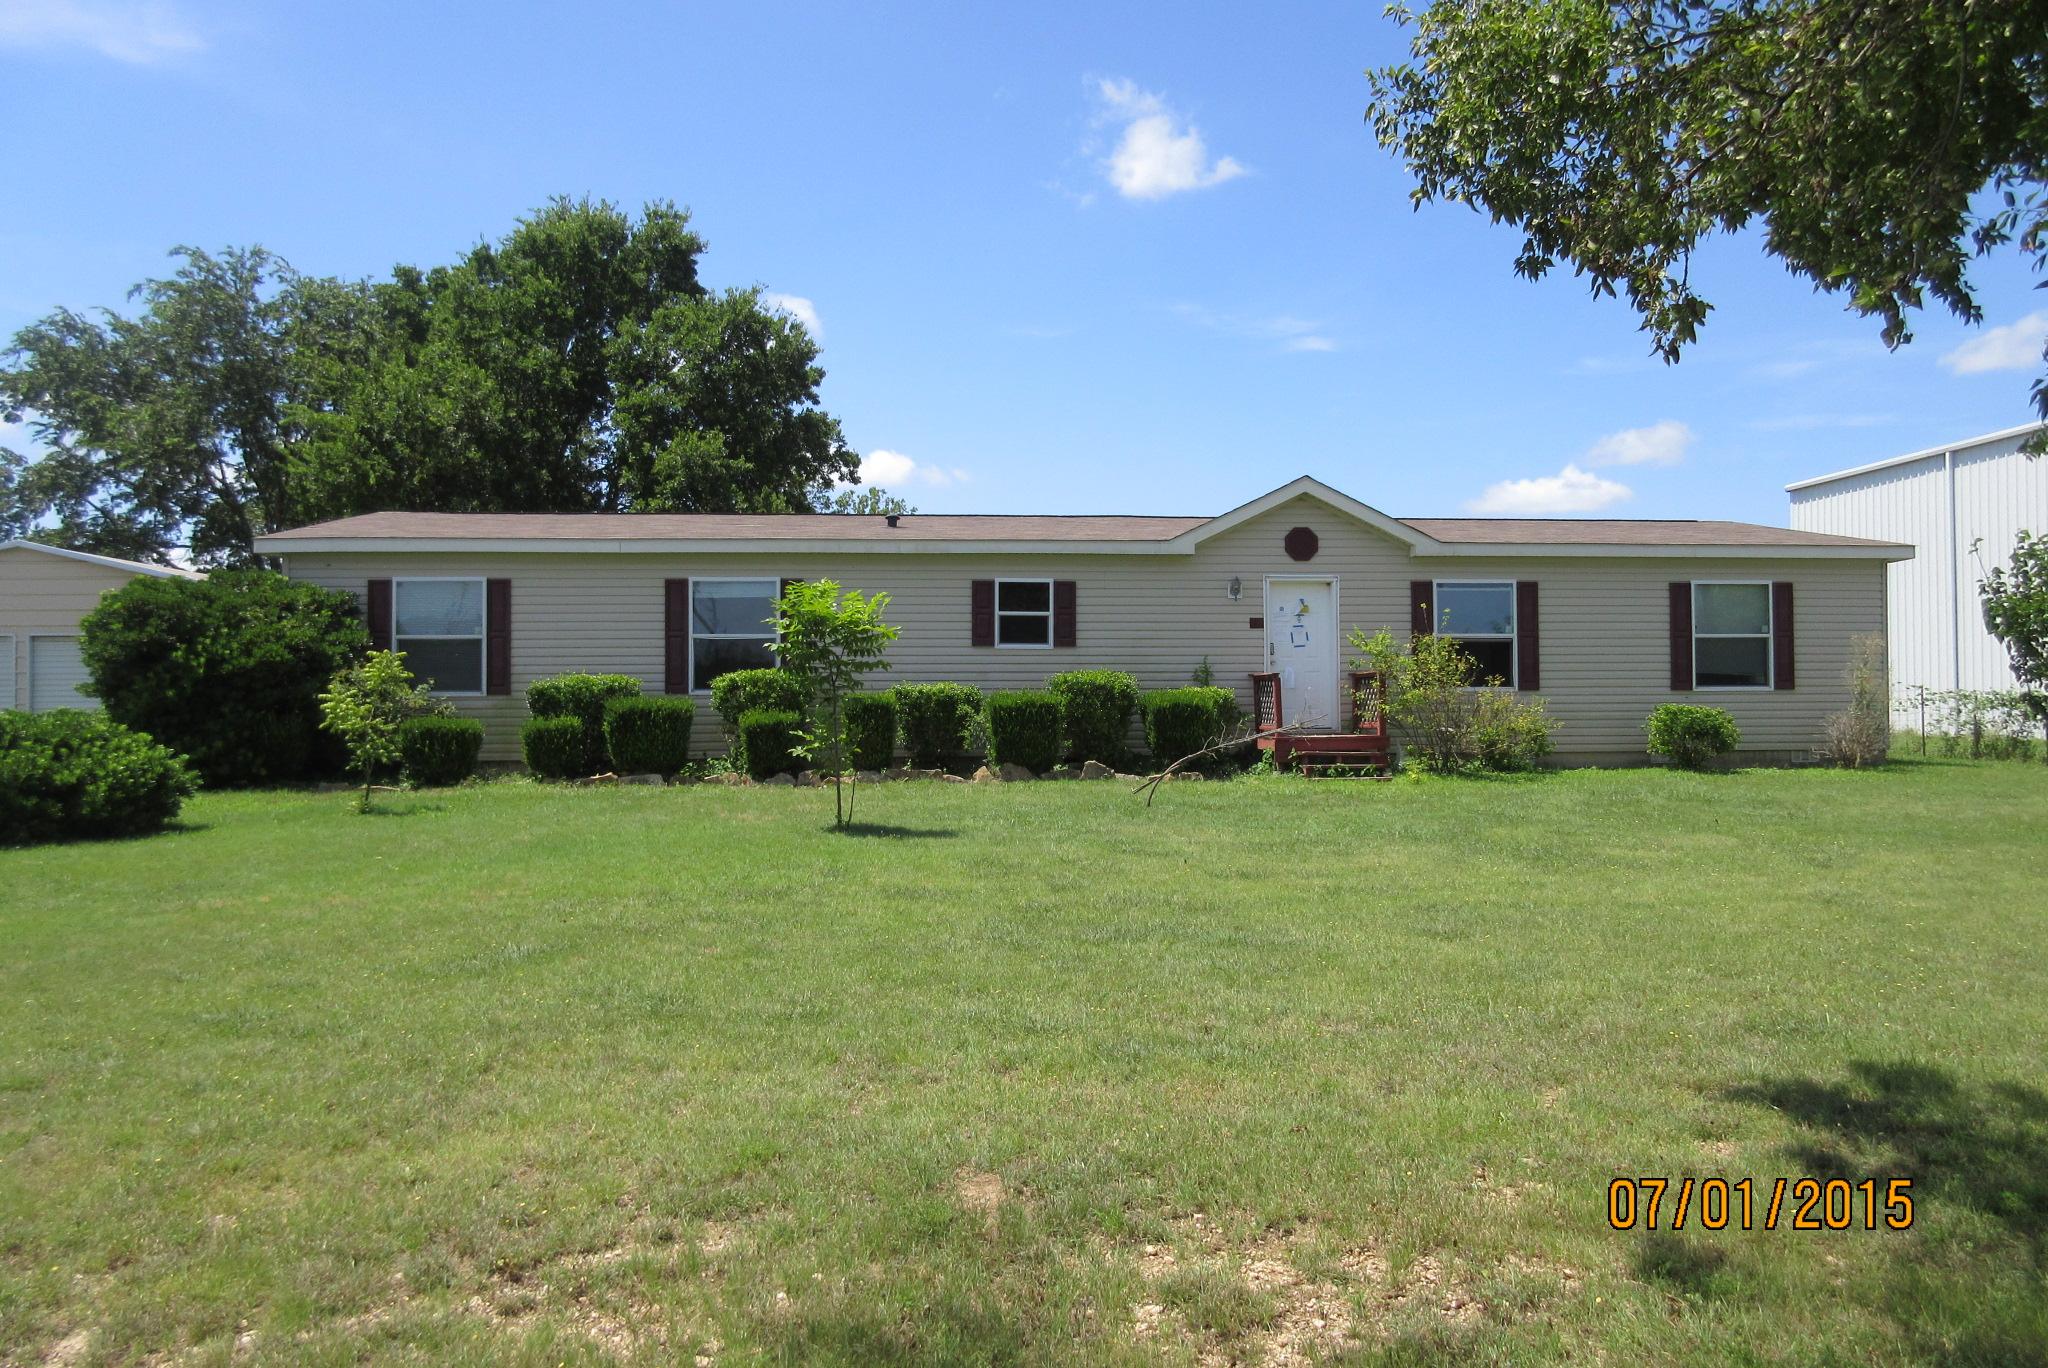 123 Airport Rd, Gatesville, TX 76528